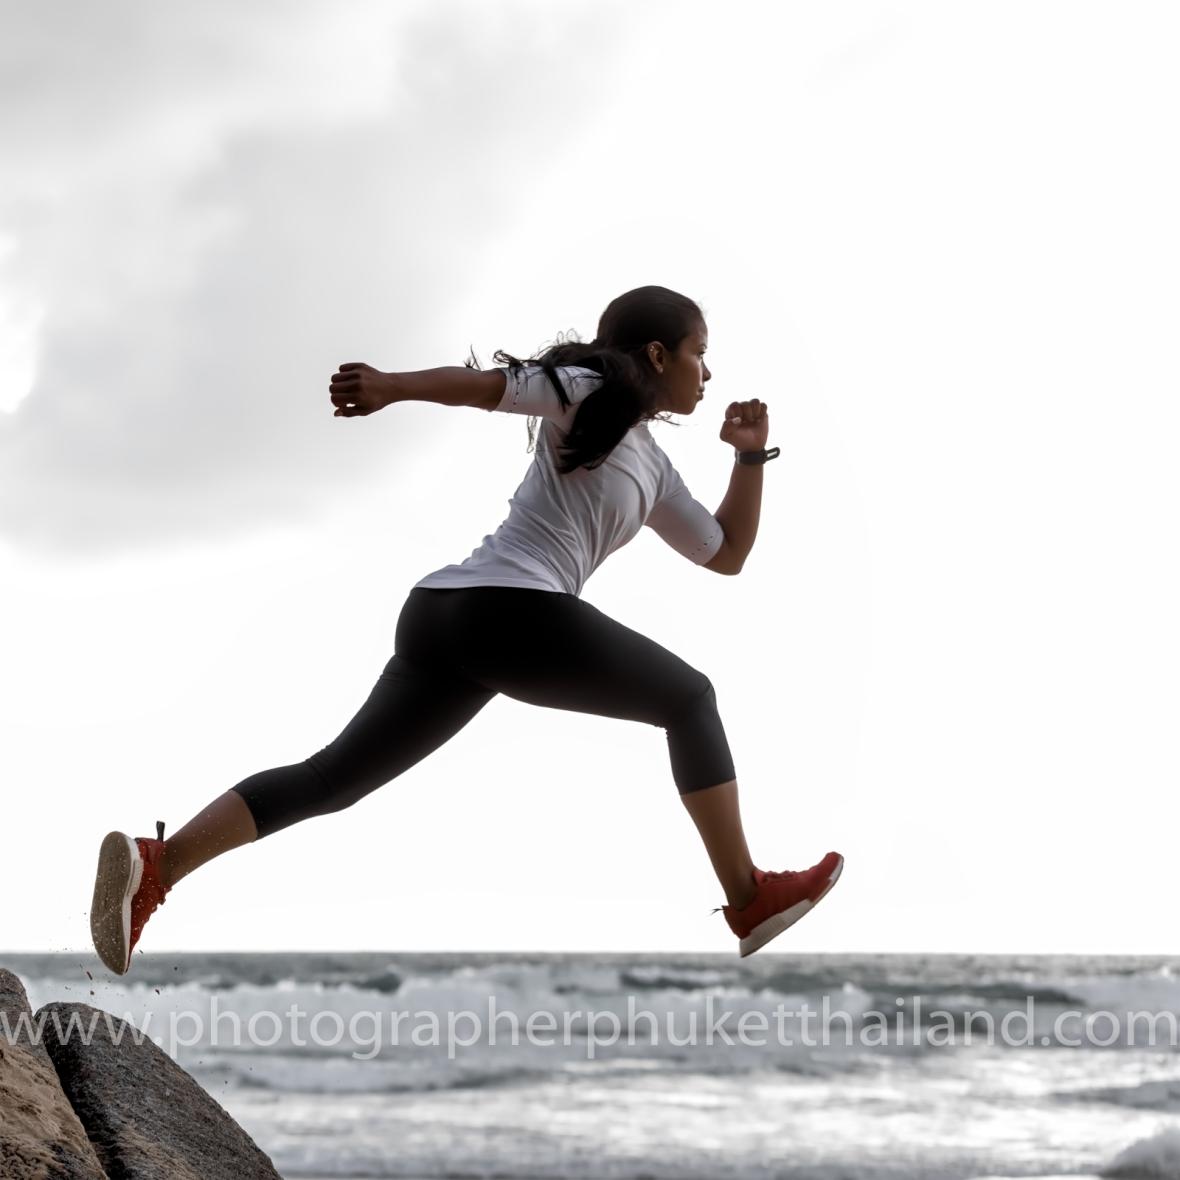 Sport trainer photoshoot at phuket